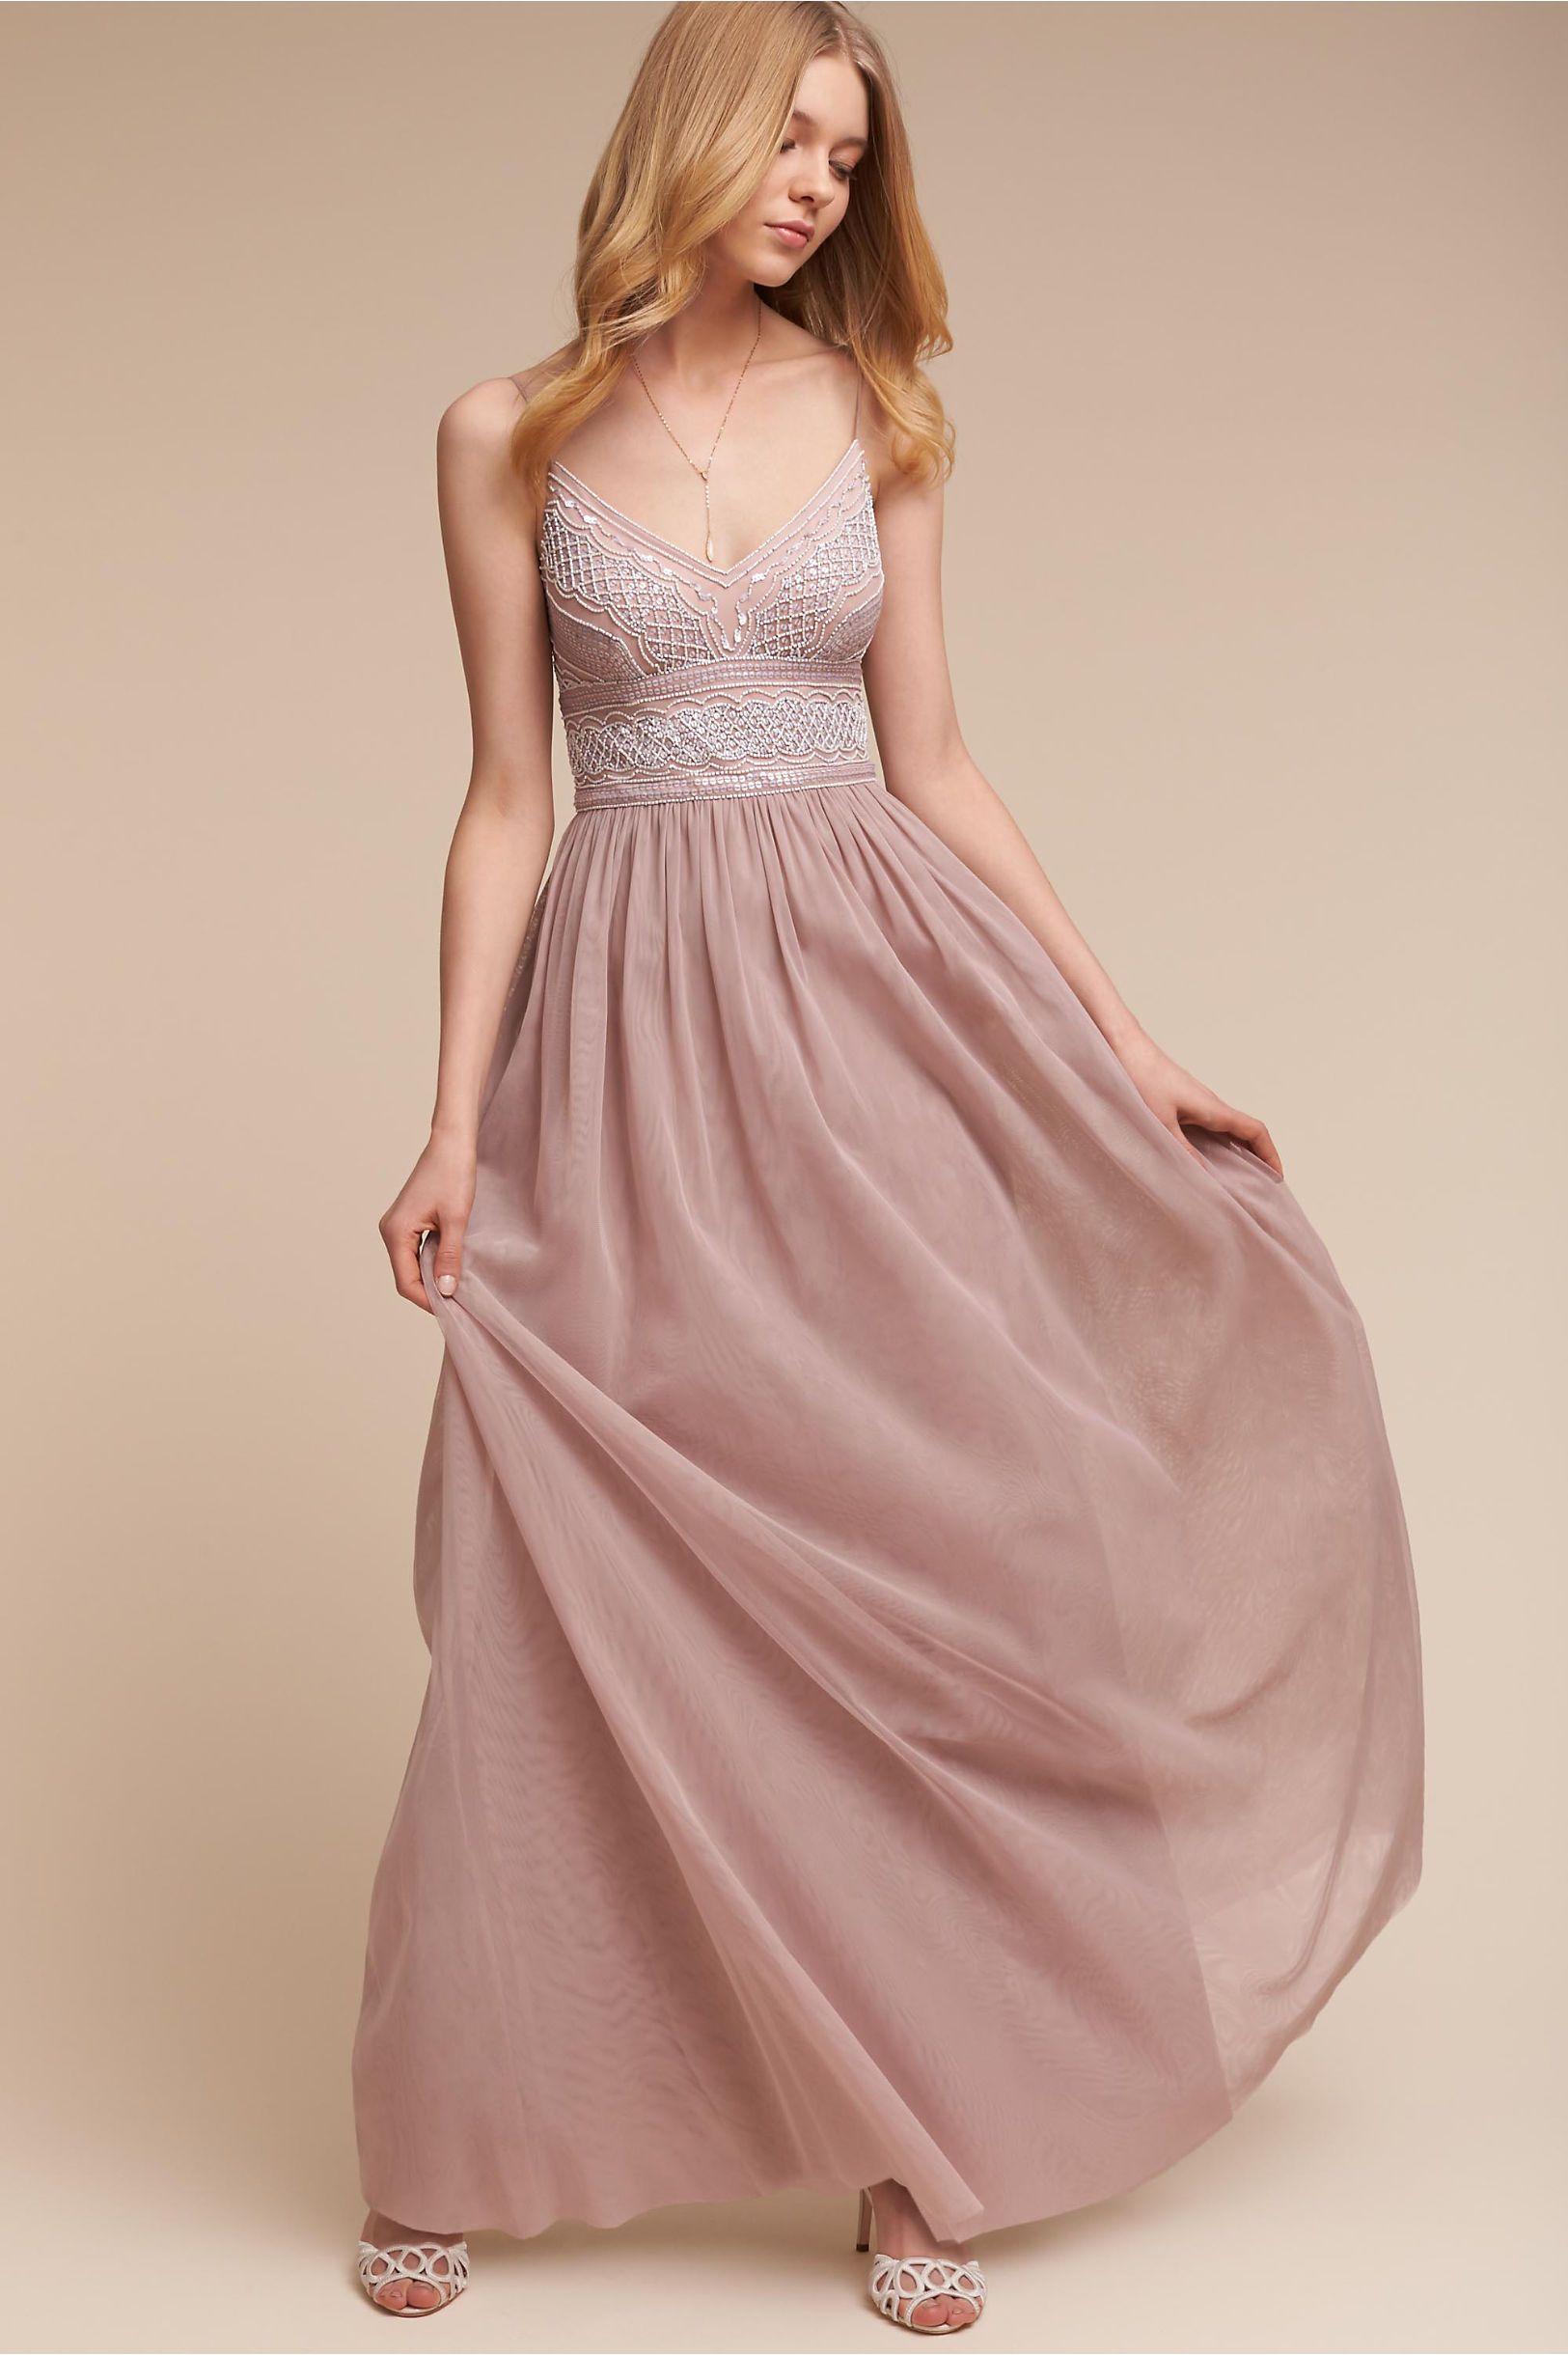 BHLDN Aida Dress in Bridesmaids Bridesmaid Dresses | BHLDN | A Pink ...